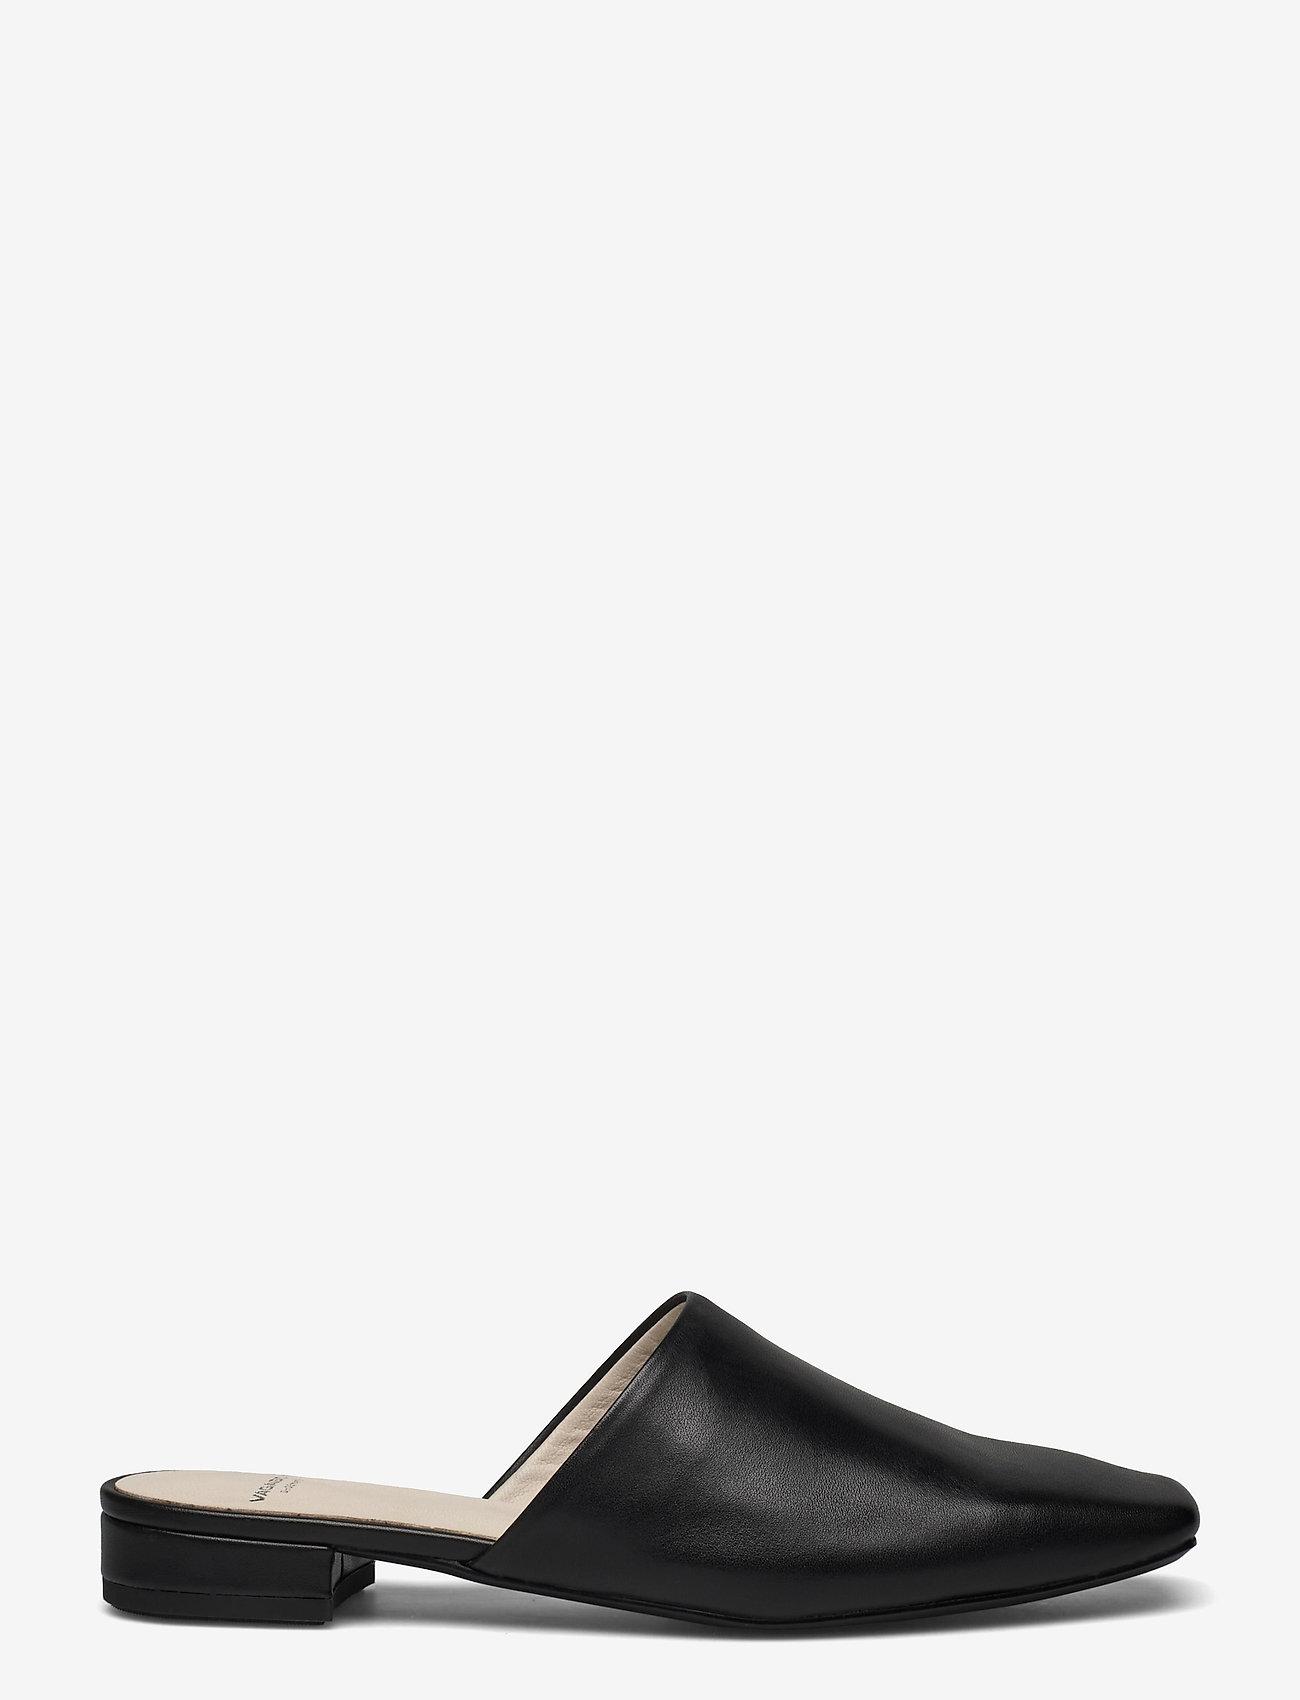 VAGABOND - LAYLA - mules & slipins - black - 0